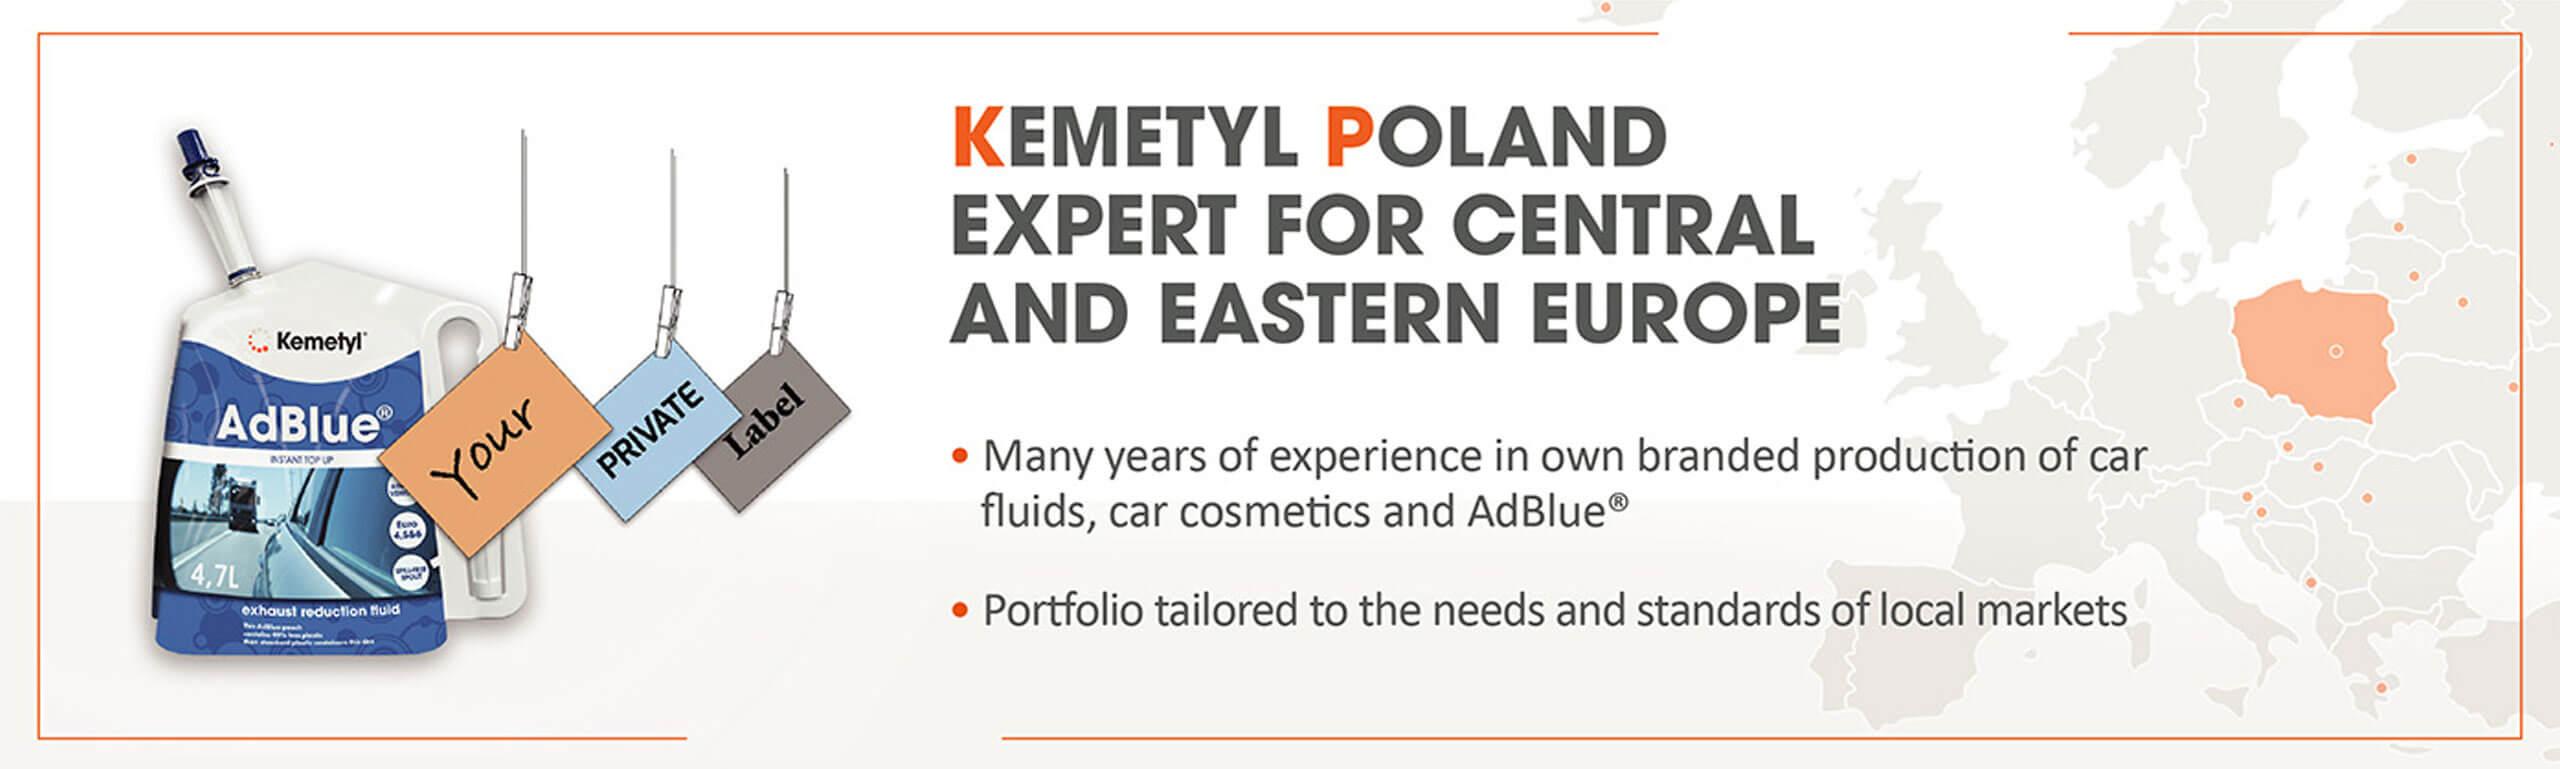 Kemetyl Poland